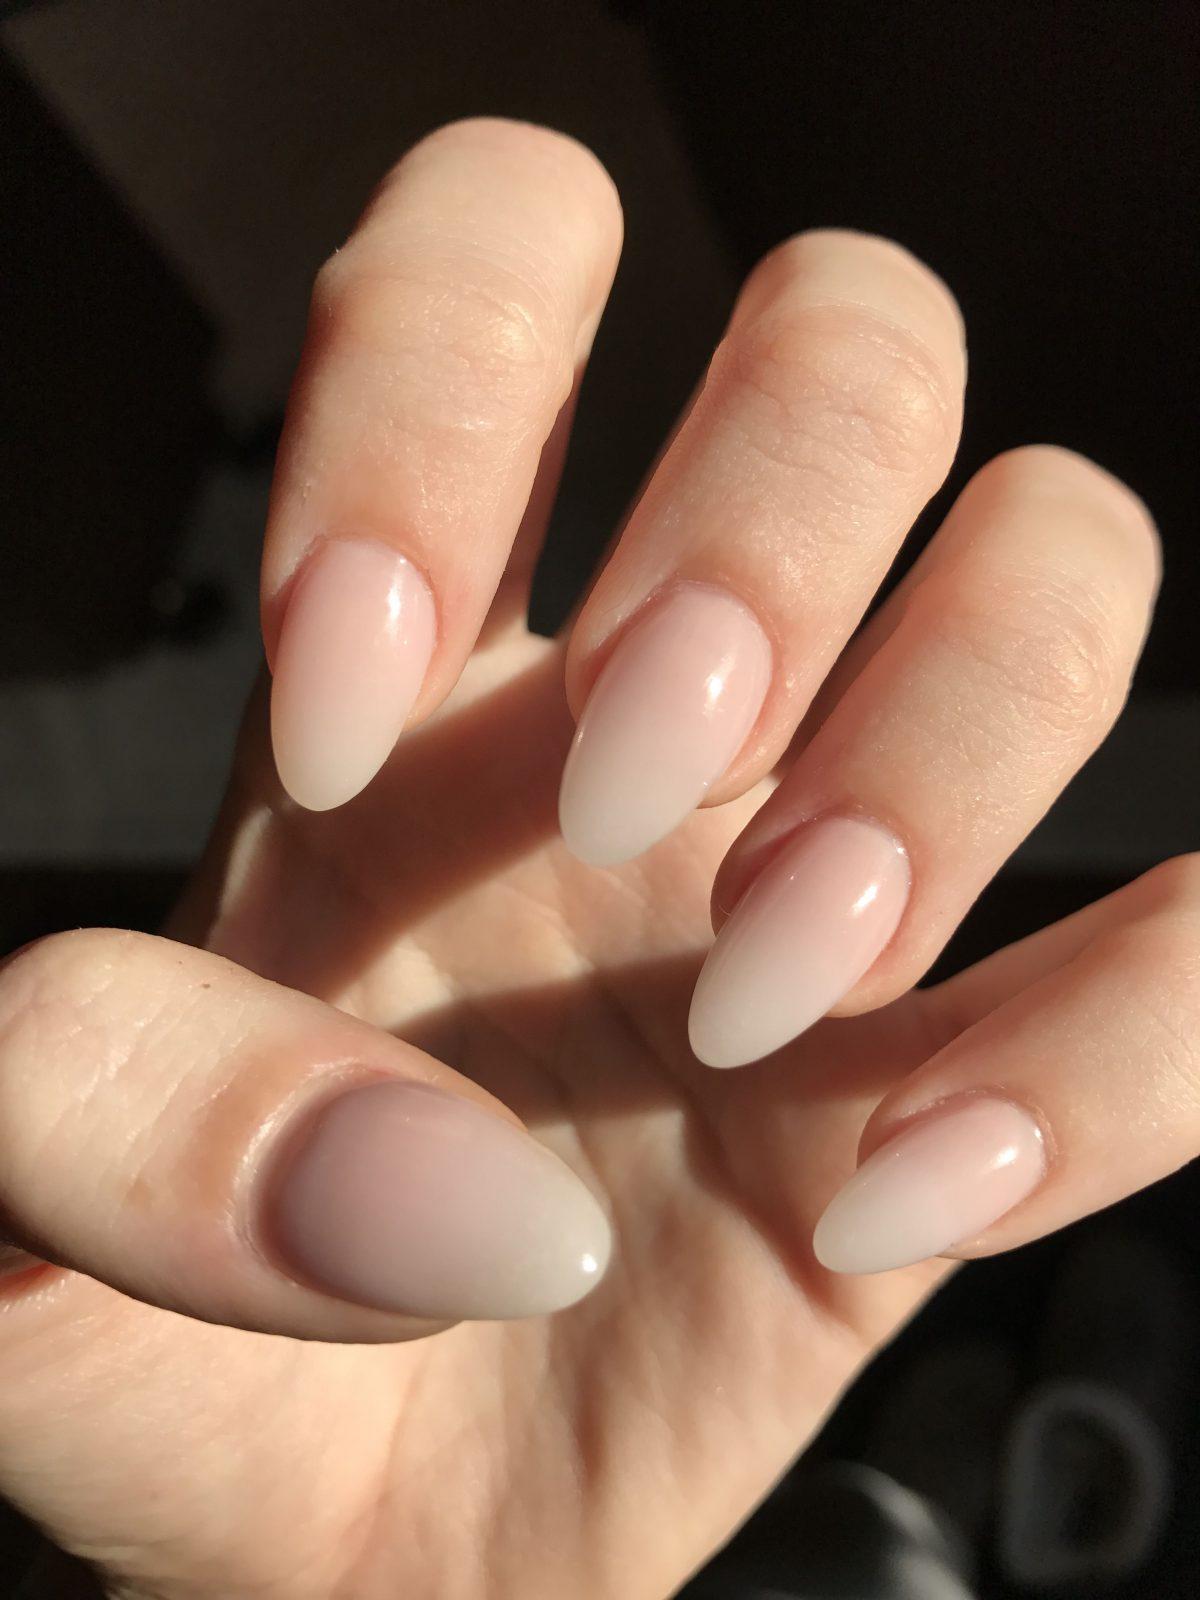 форма ногтей миндаль - пример 2